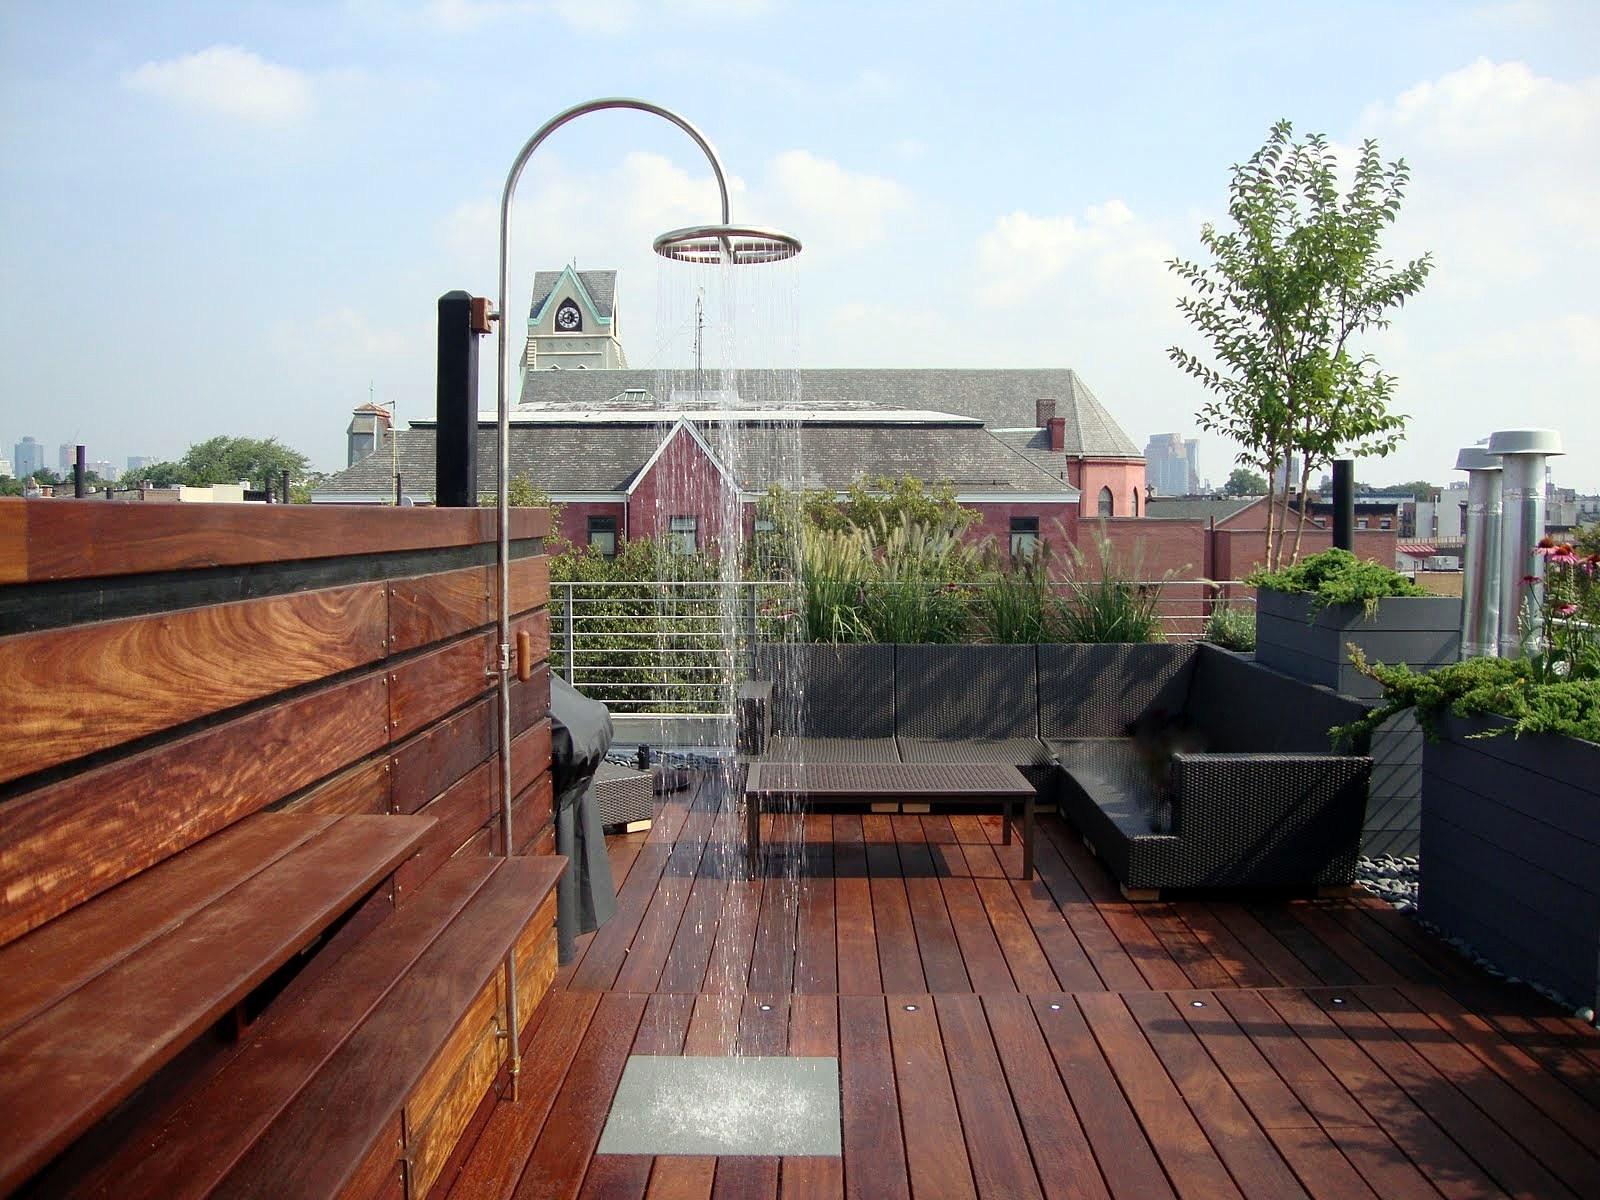 hardwood decking and siding